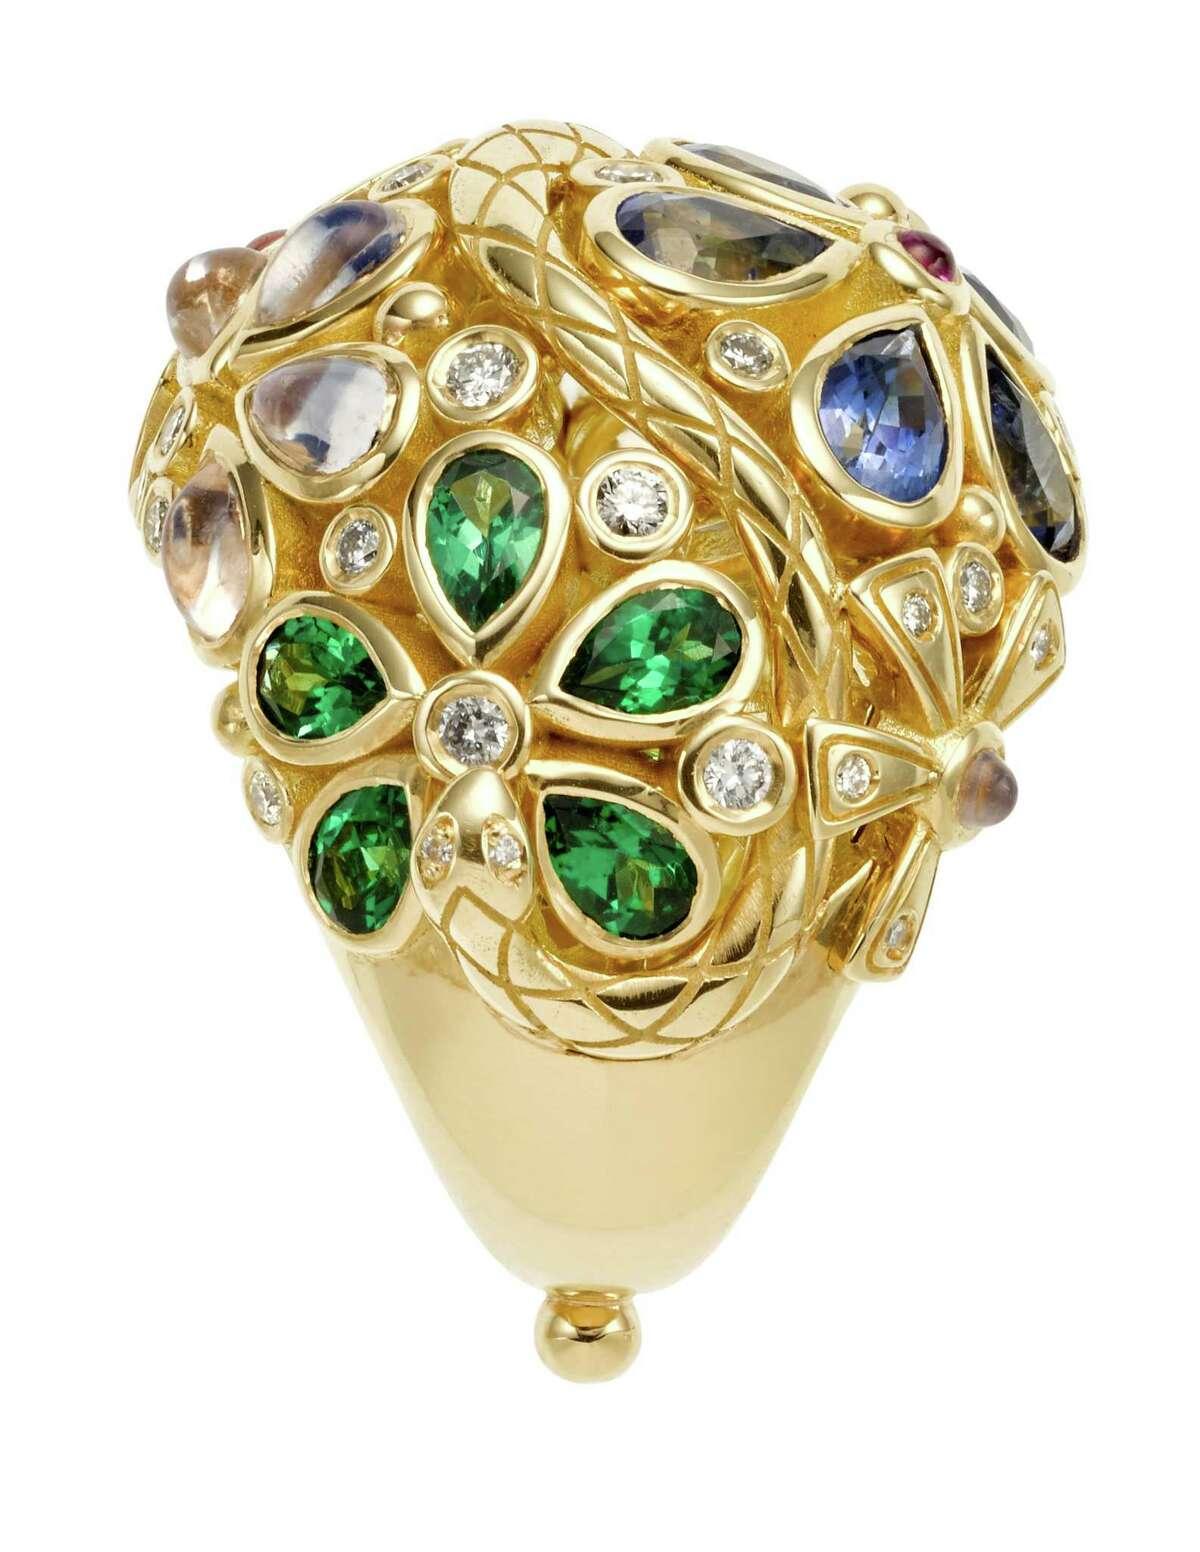 18K Flower Serpent Ring with royal blue moonstone, blue sapphire, tsavorite, pink tourmaline and diamond byTemple St. Clair, $15,000, at Saks Fifth Avenue and Deutsch & Deutsch